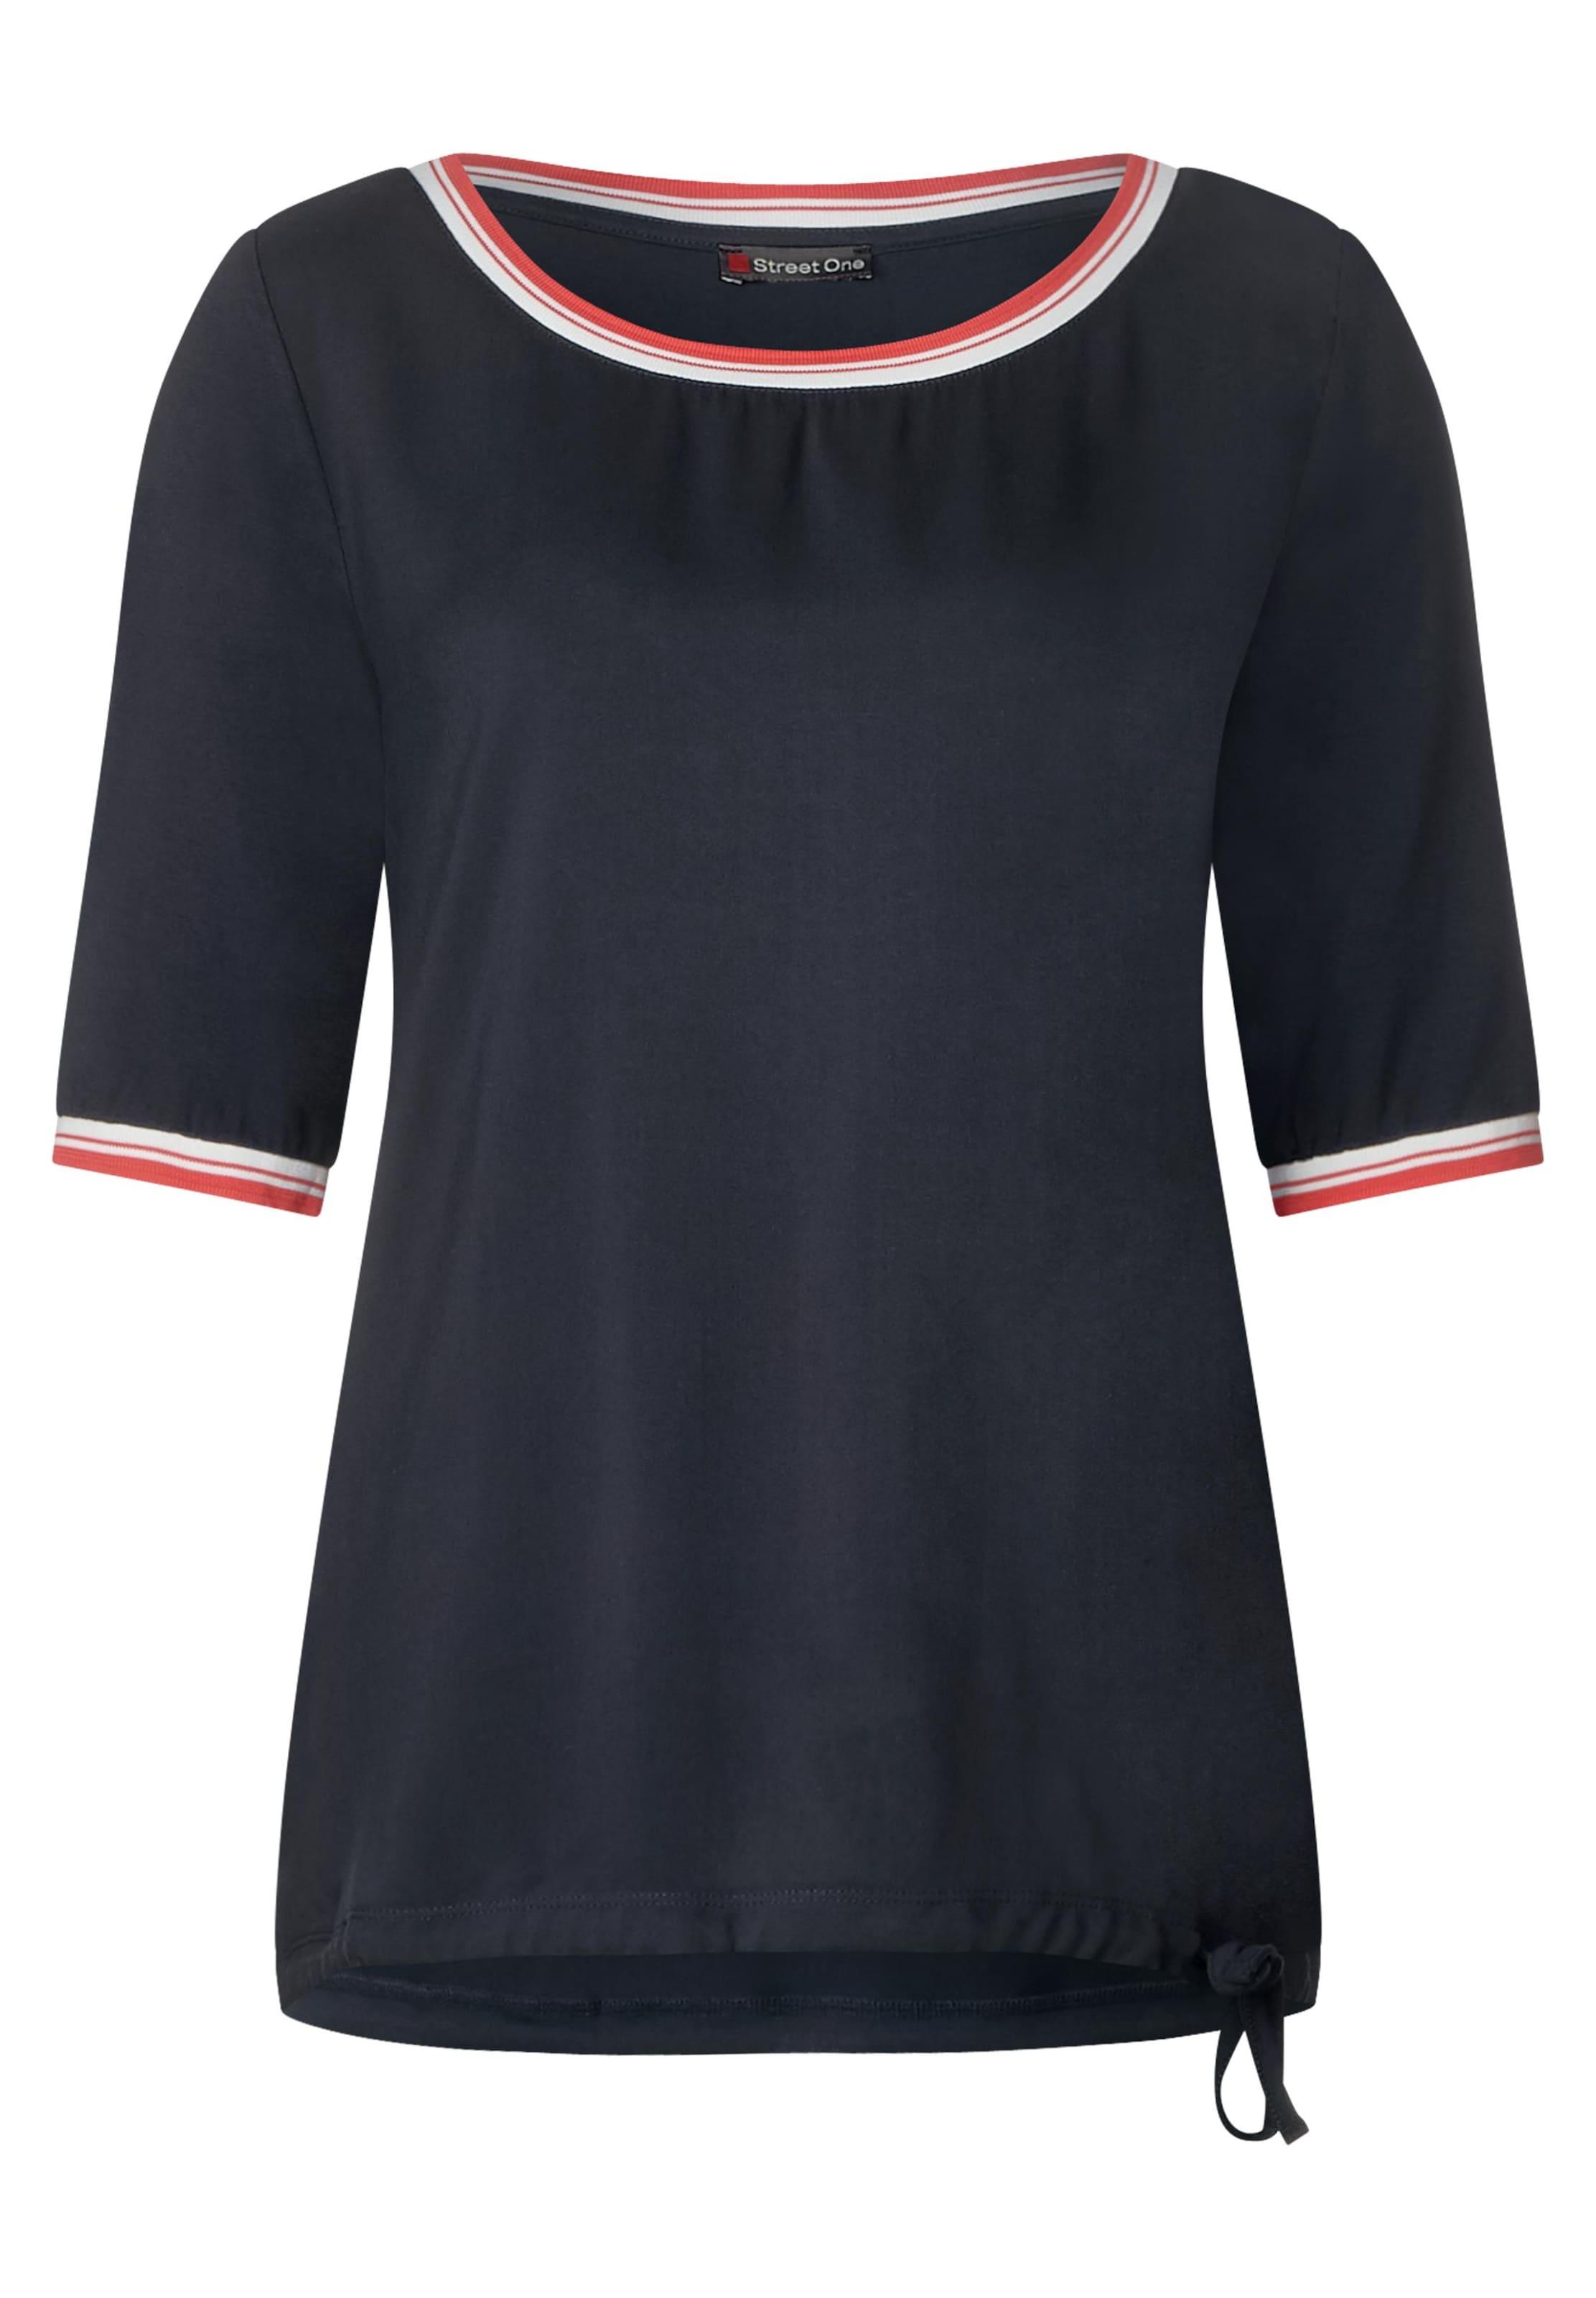 Shirt One DunkelblauOrangerot Street Weiß In MpzSUVq